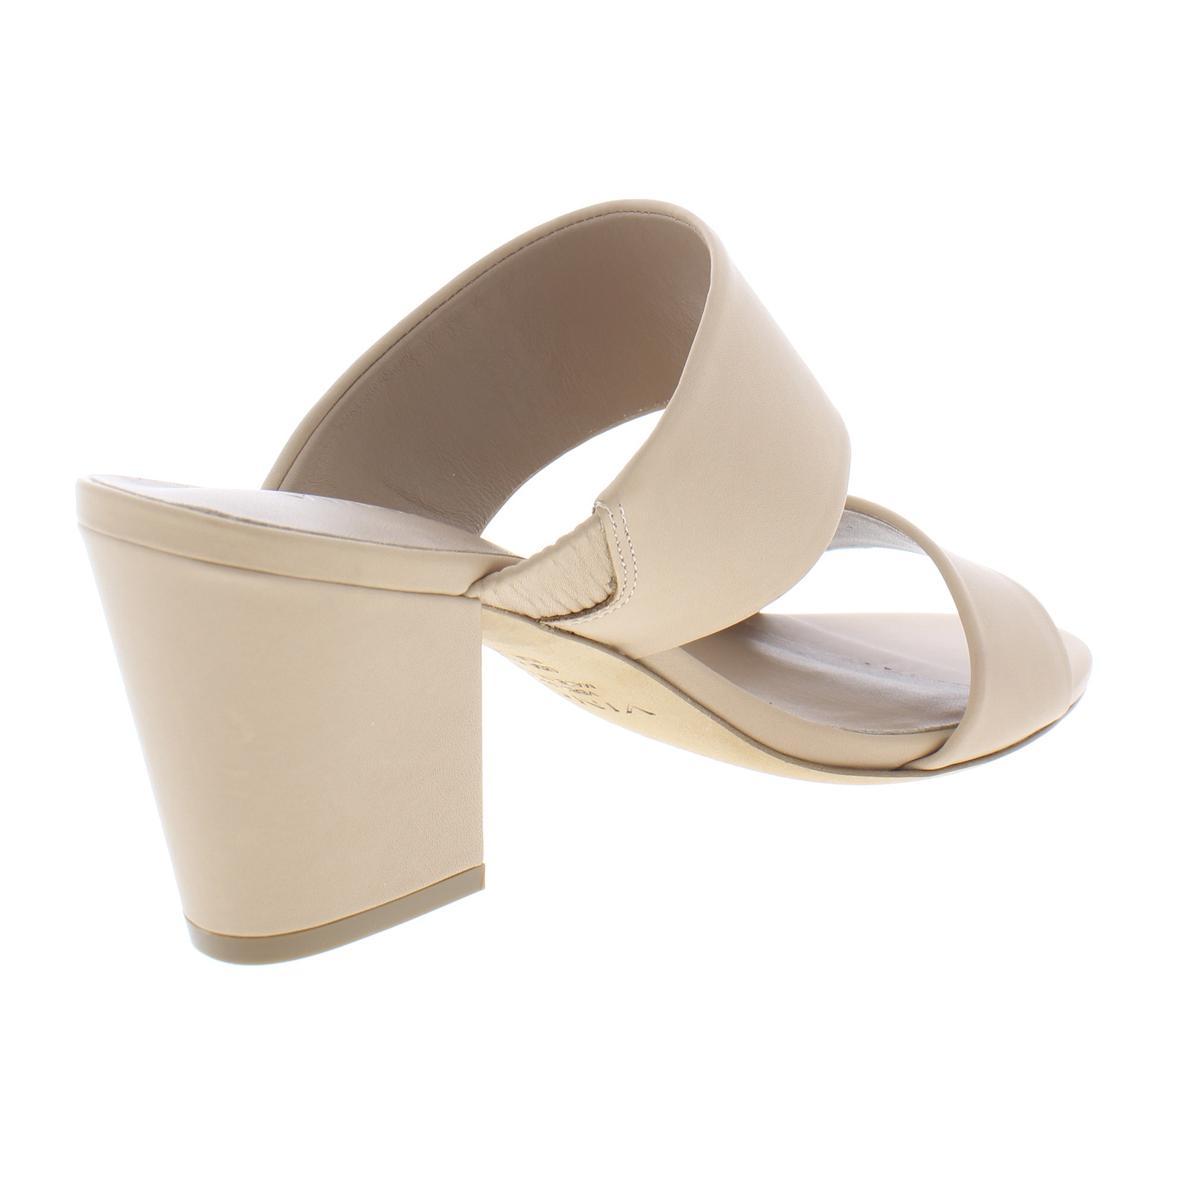 Vince-Womens-Benetta-Suede-Block-Heel-Open-Toe-Dress-Sandals-Shoes-BHFO-8084 thumbnail 4